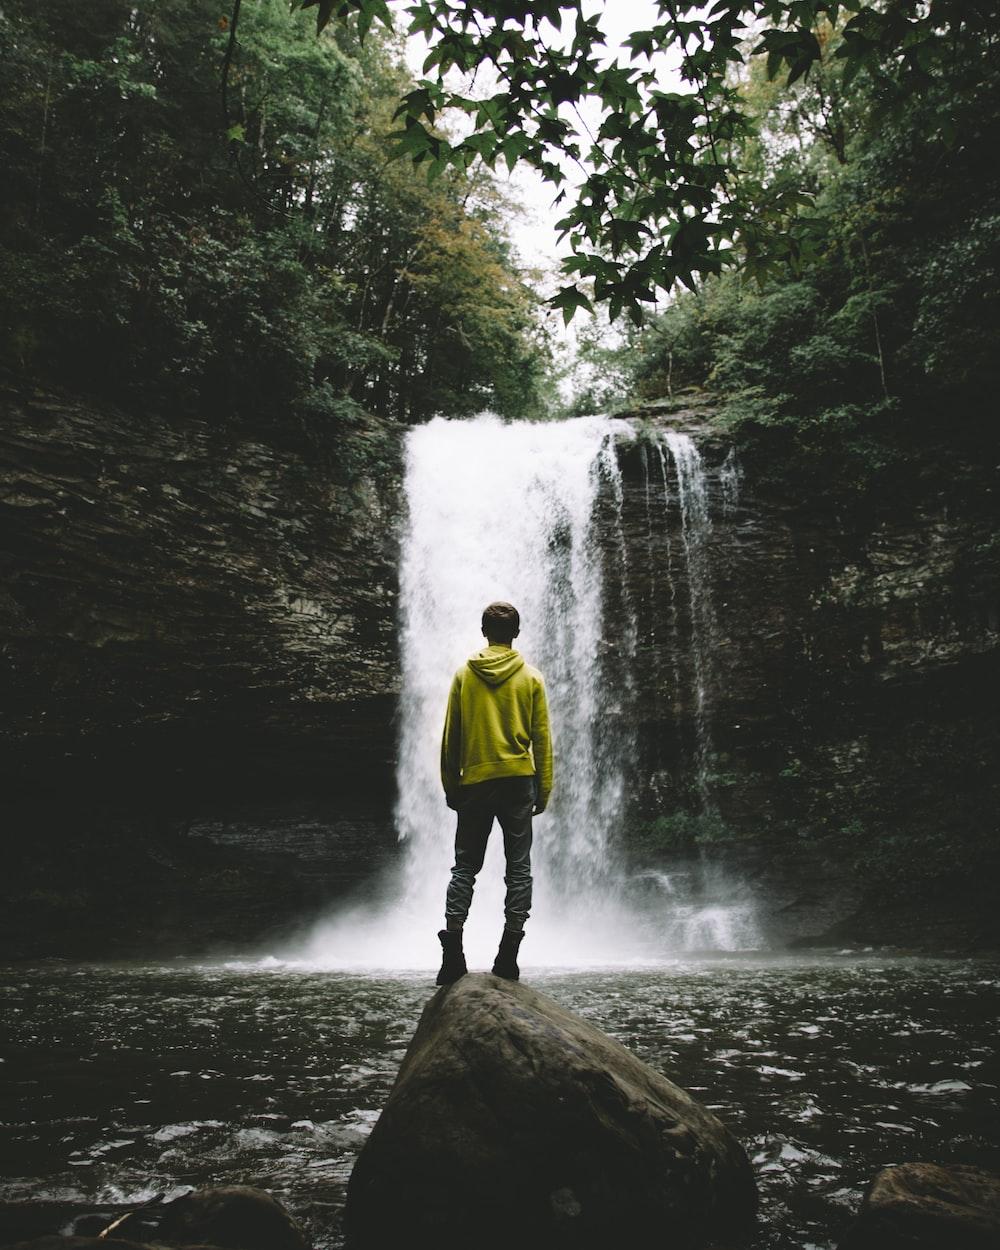 man standing on rock looking at waterfalls